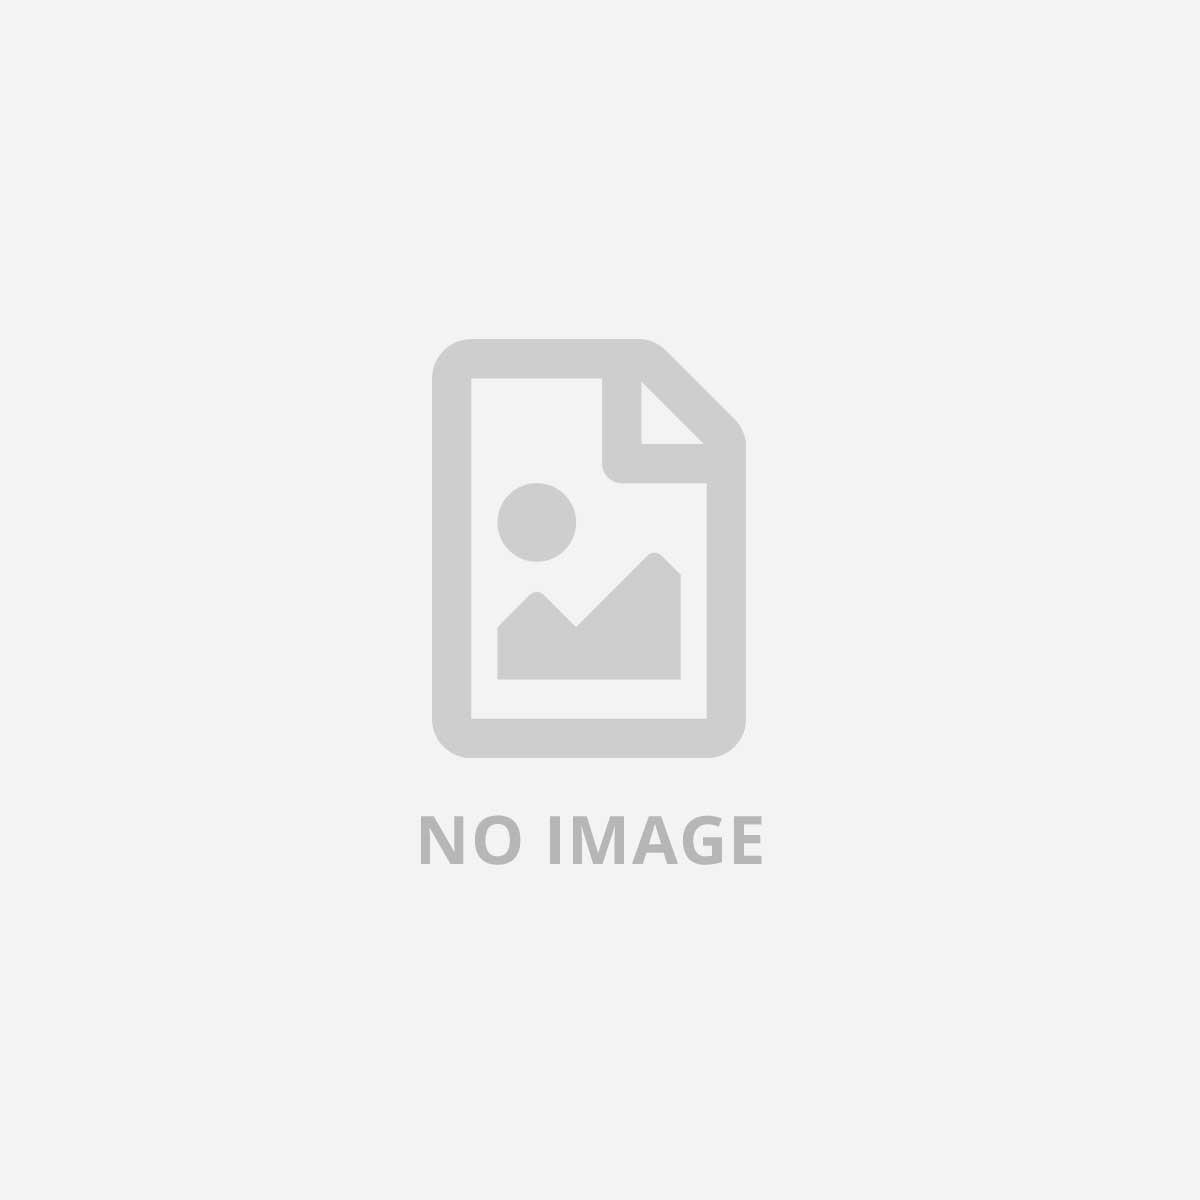 OLIVETTI NASTRO 3 PUNTE 2605/3NR